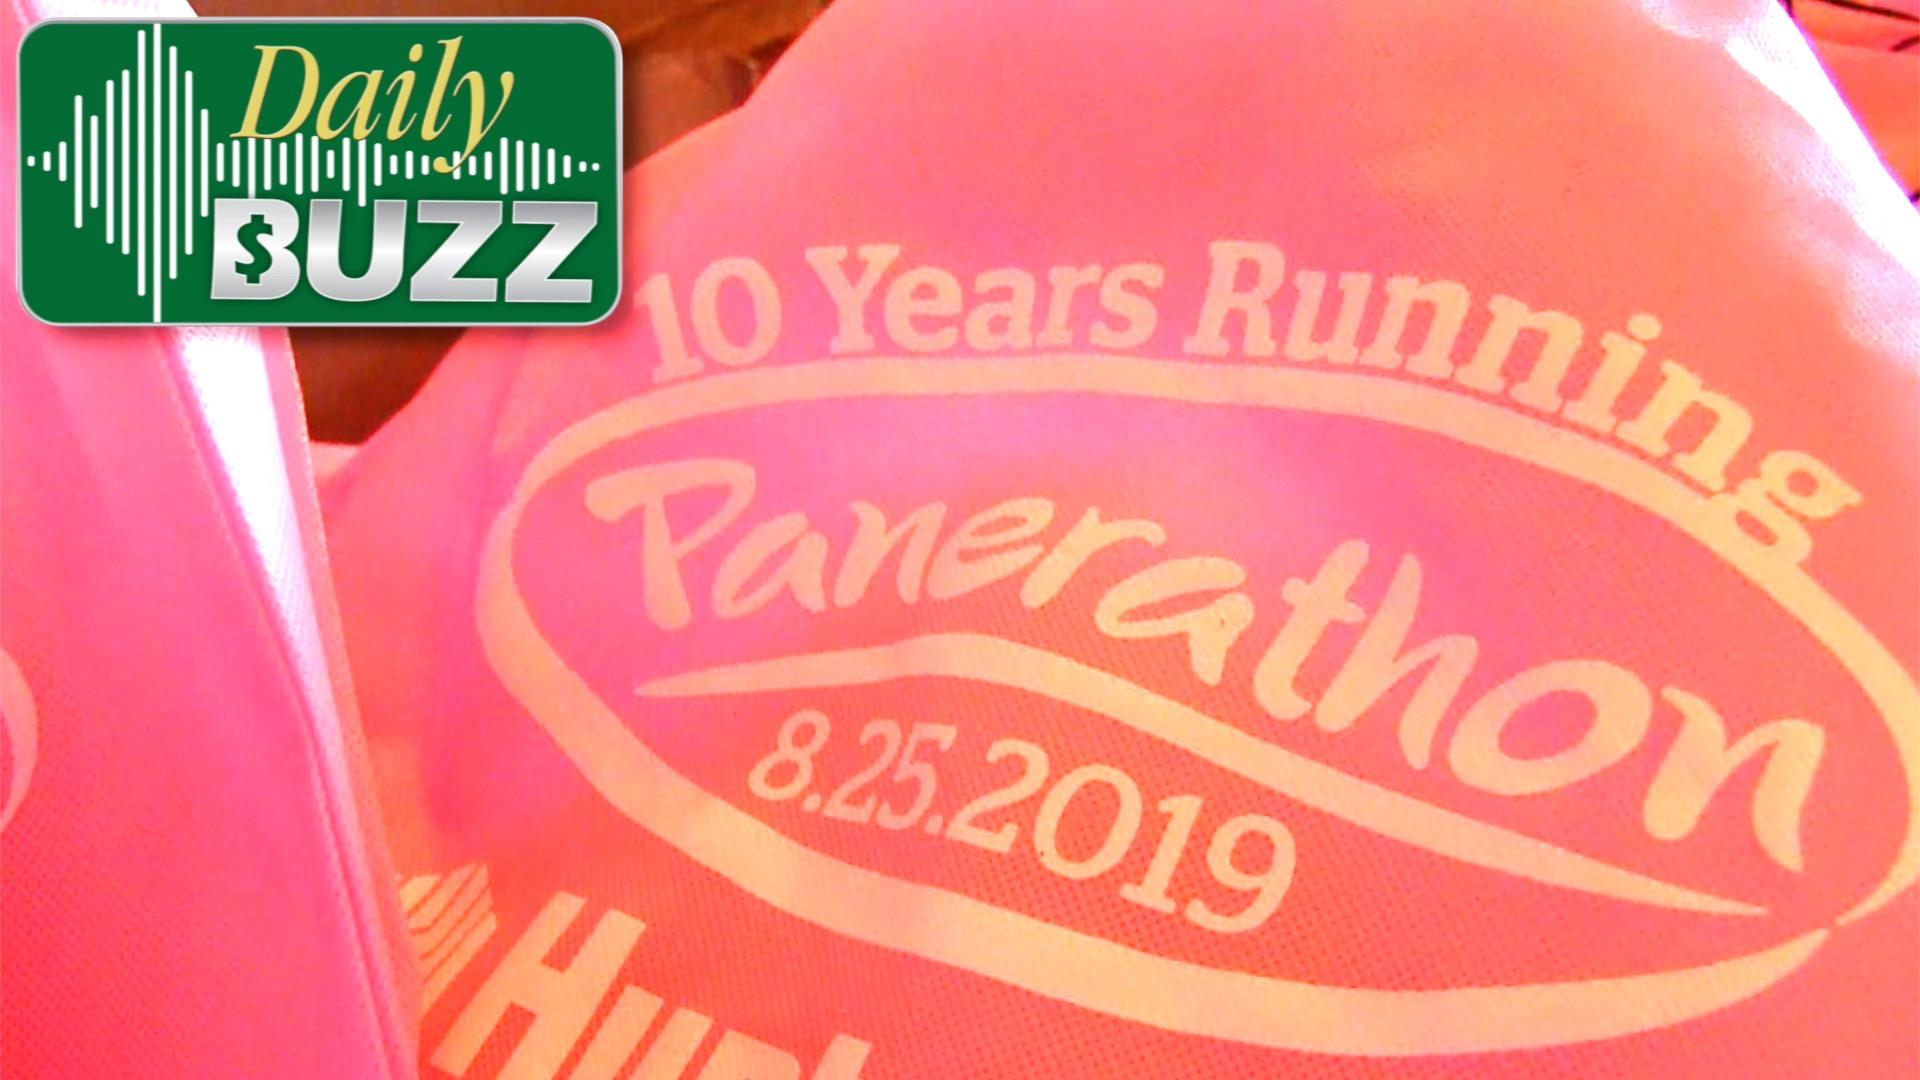 10th Annual Panerathon Sunday